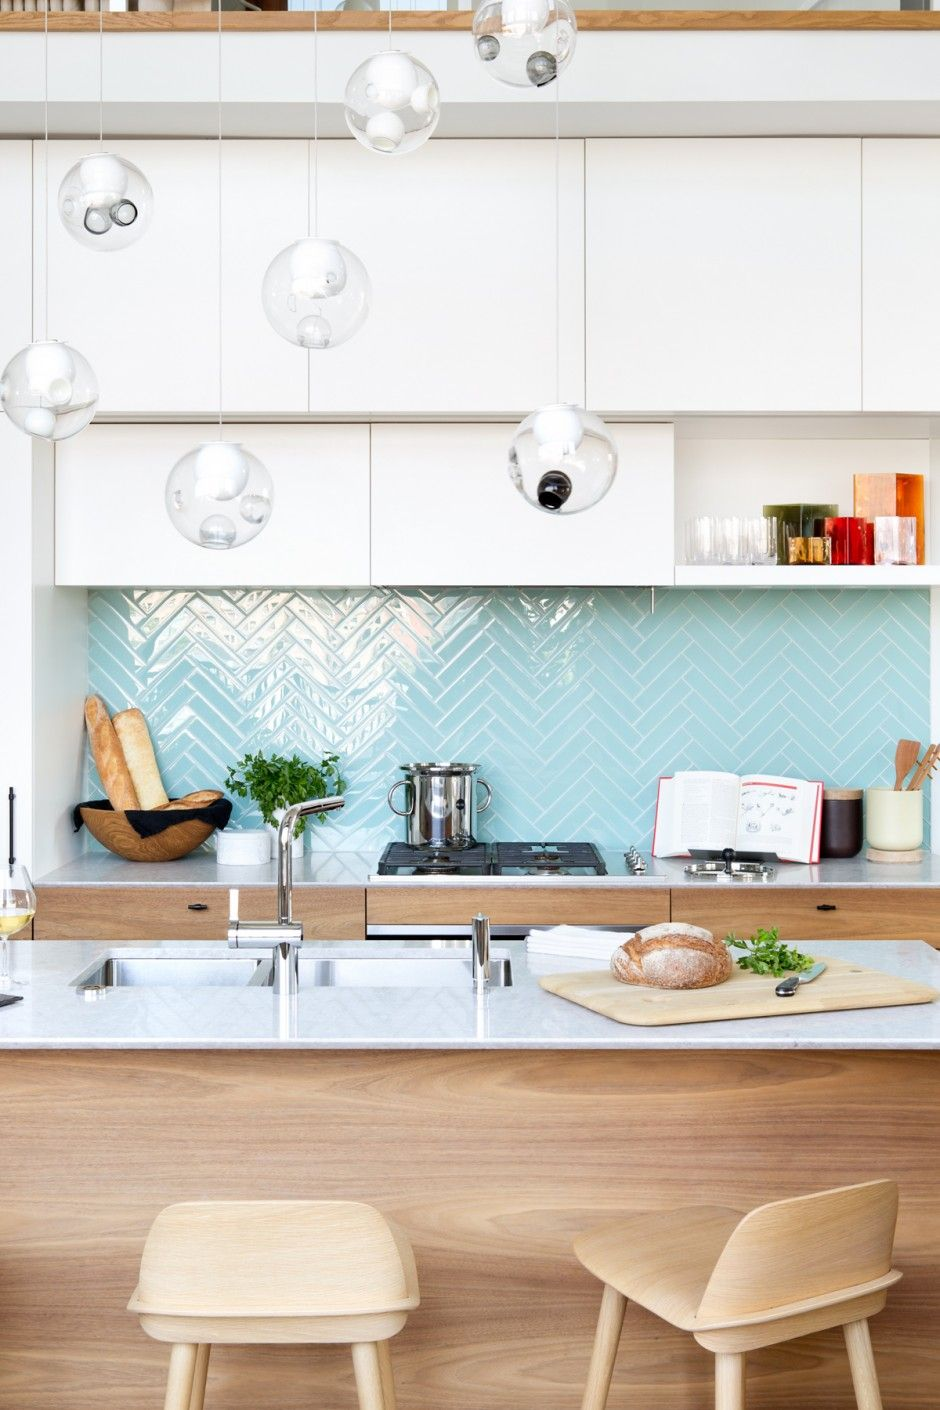 Azulejo lindo | Cozinhas | Pinterest | Father, Kitchens and Interiors